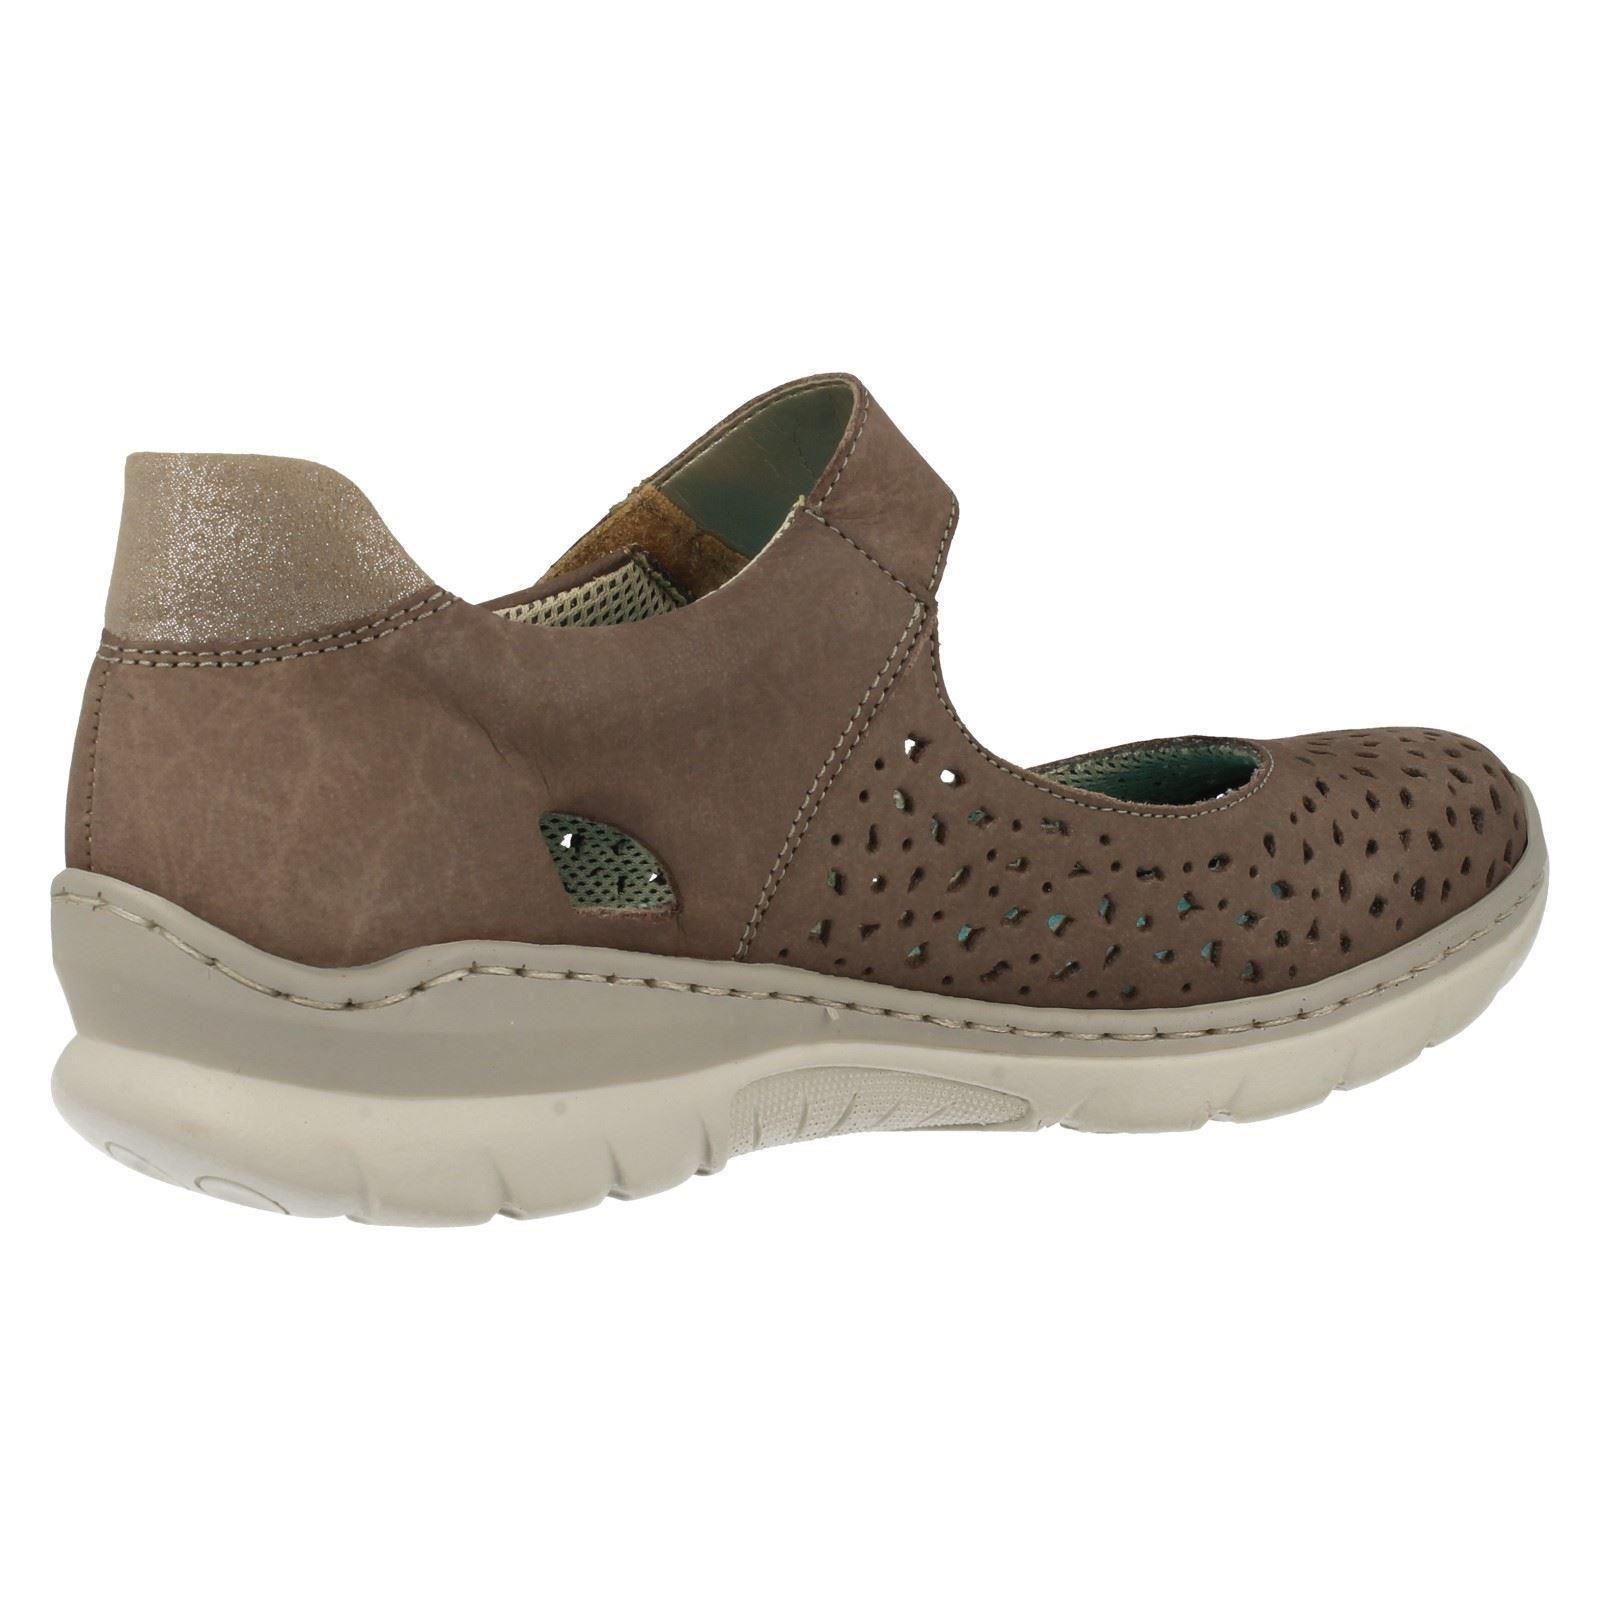 Ladies Rieker Casual Flat Shoes L3255